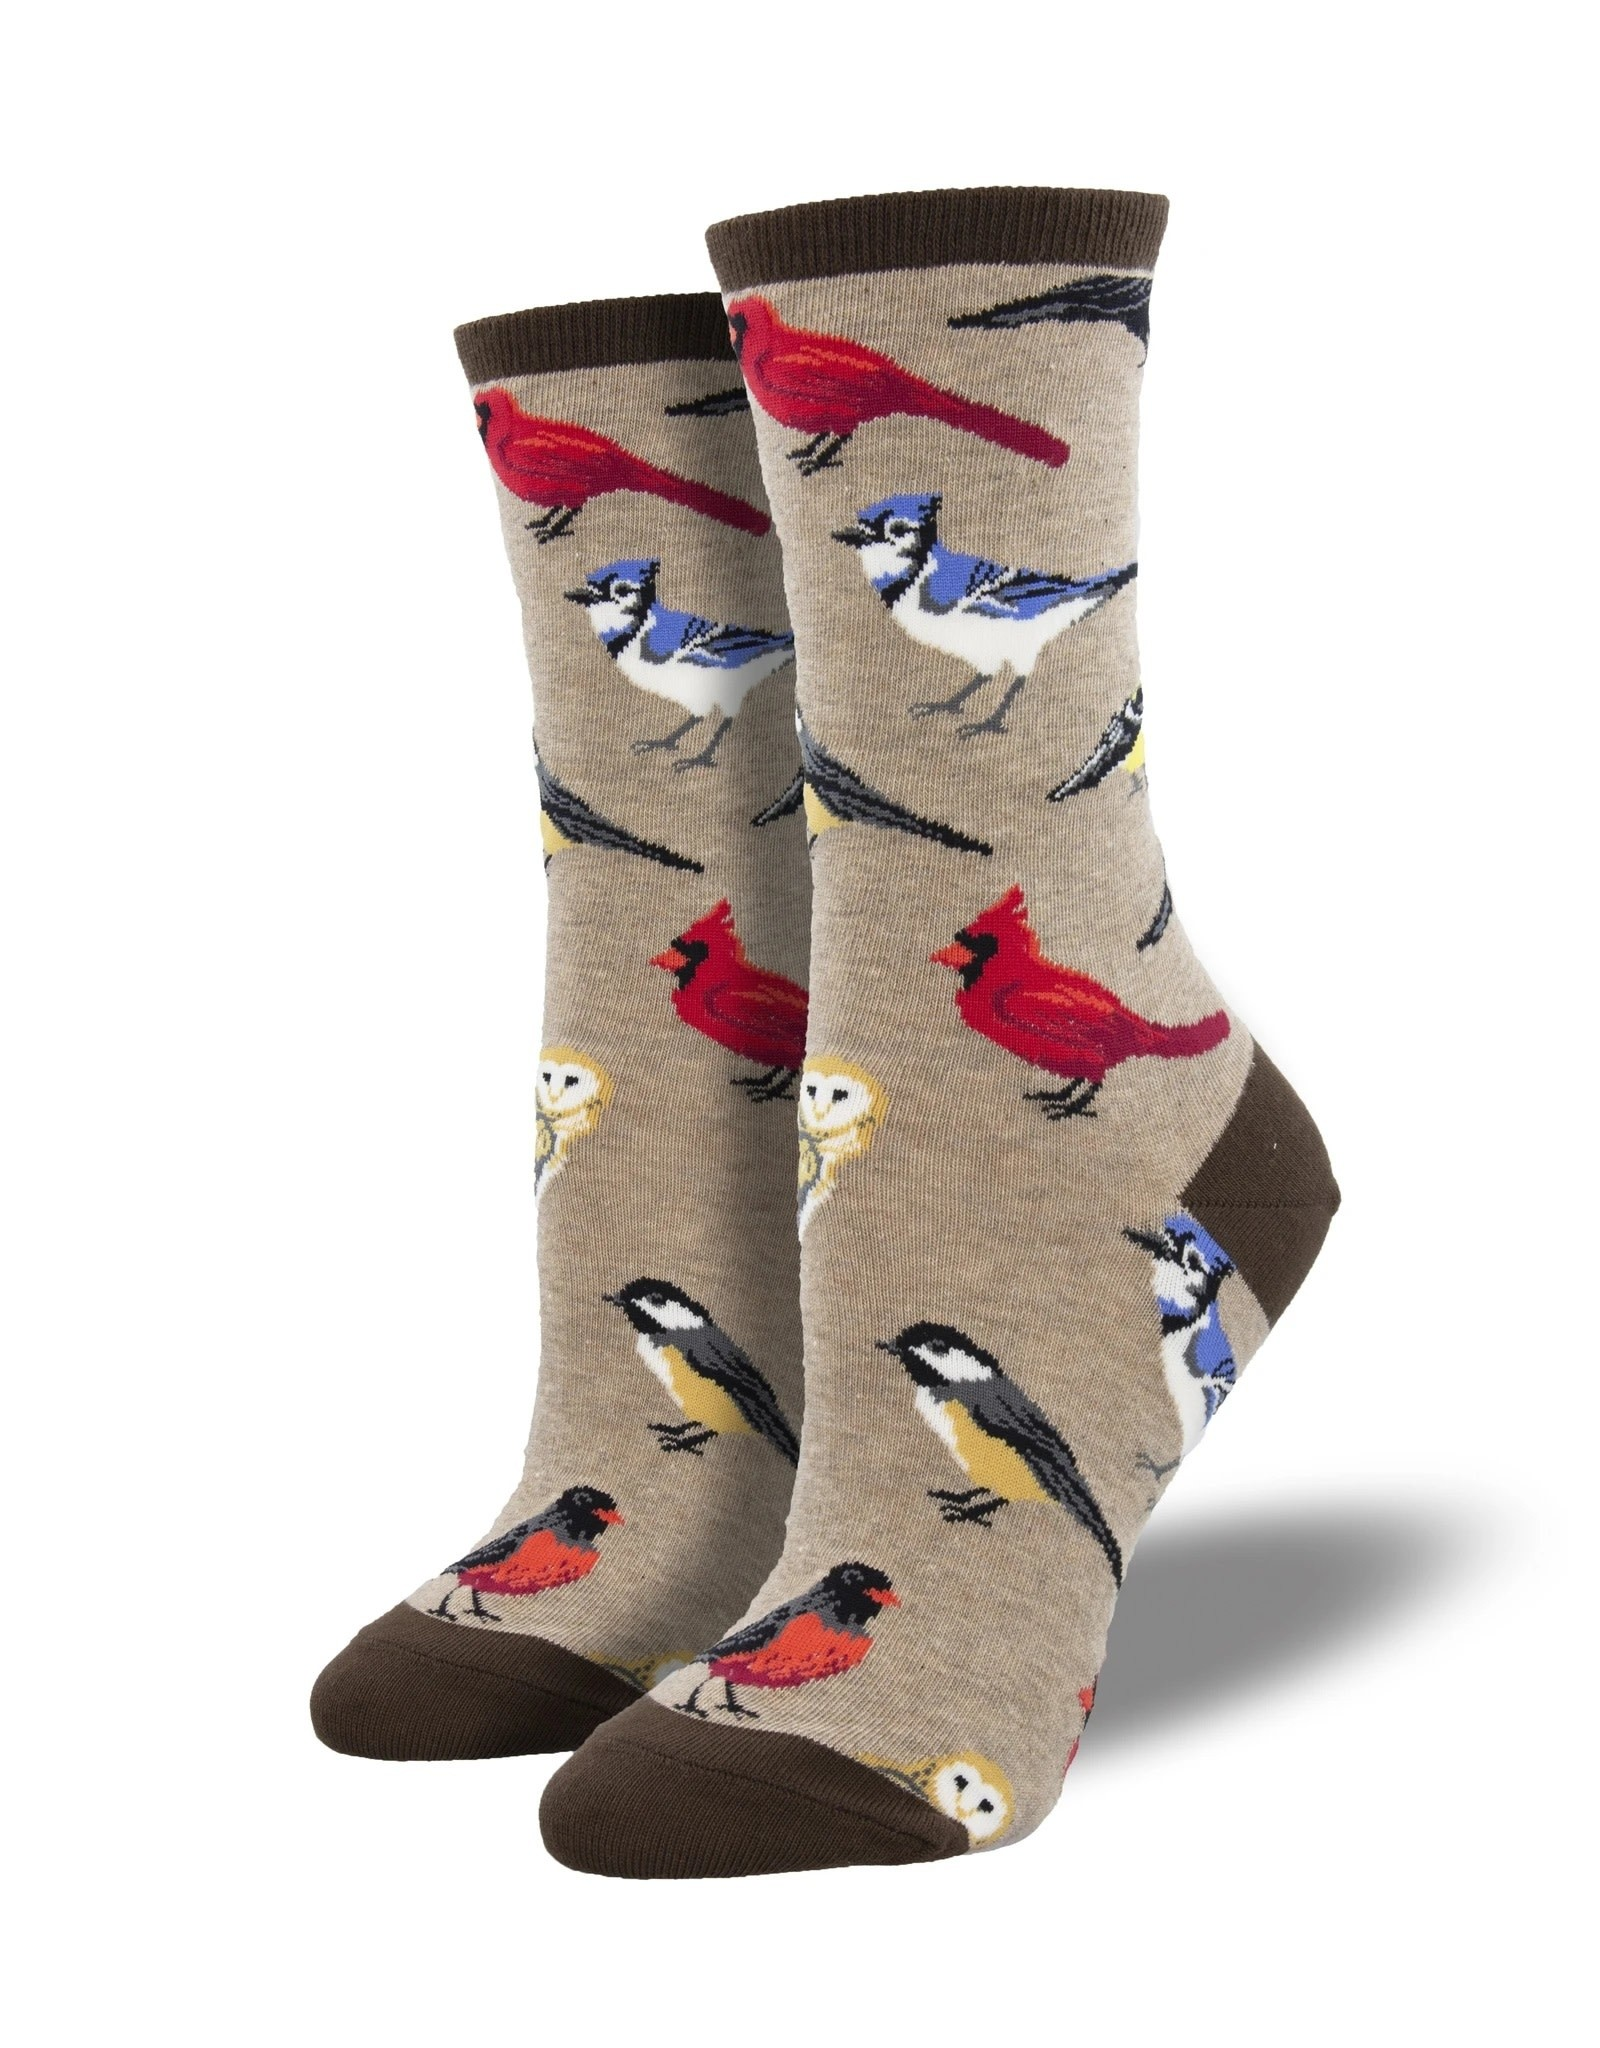 Socksmith SS Crew Socks